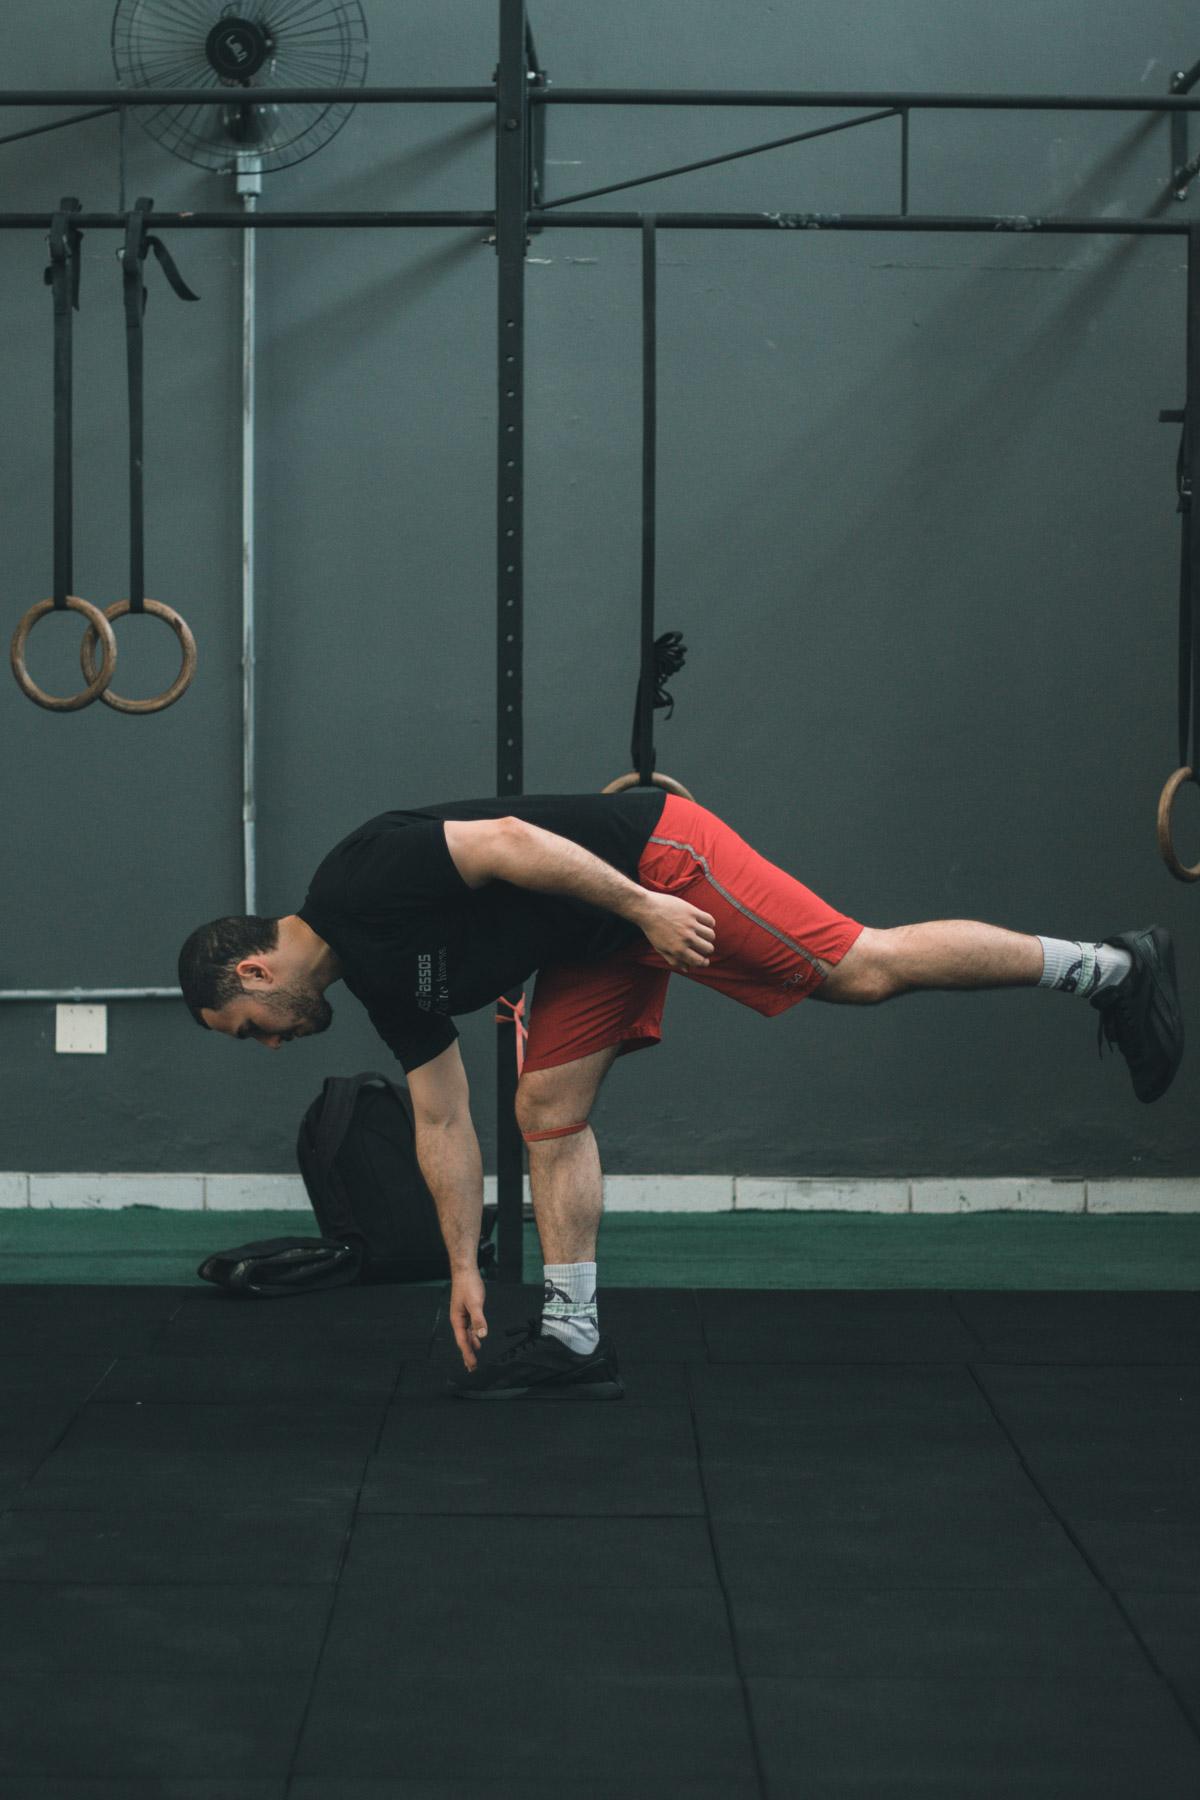 Placa de borracha para Academias e CrossFit